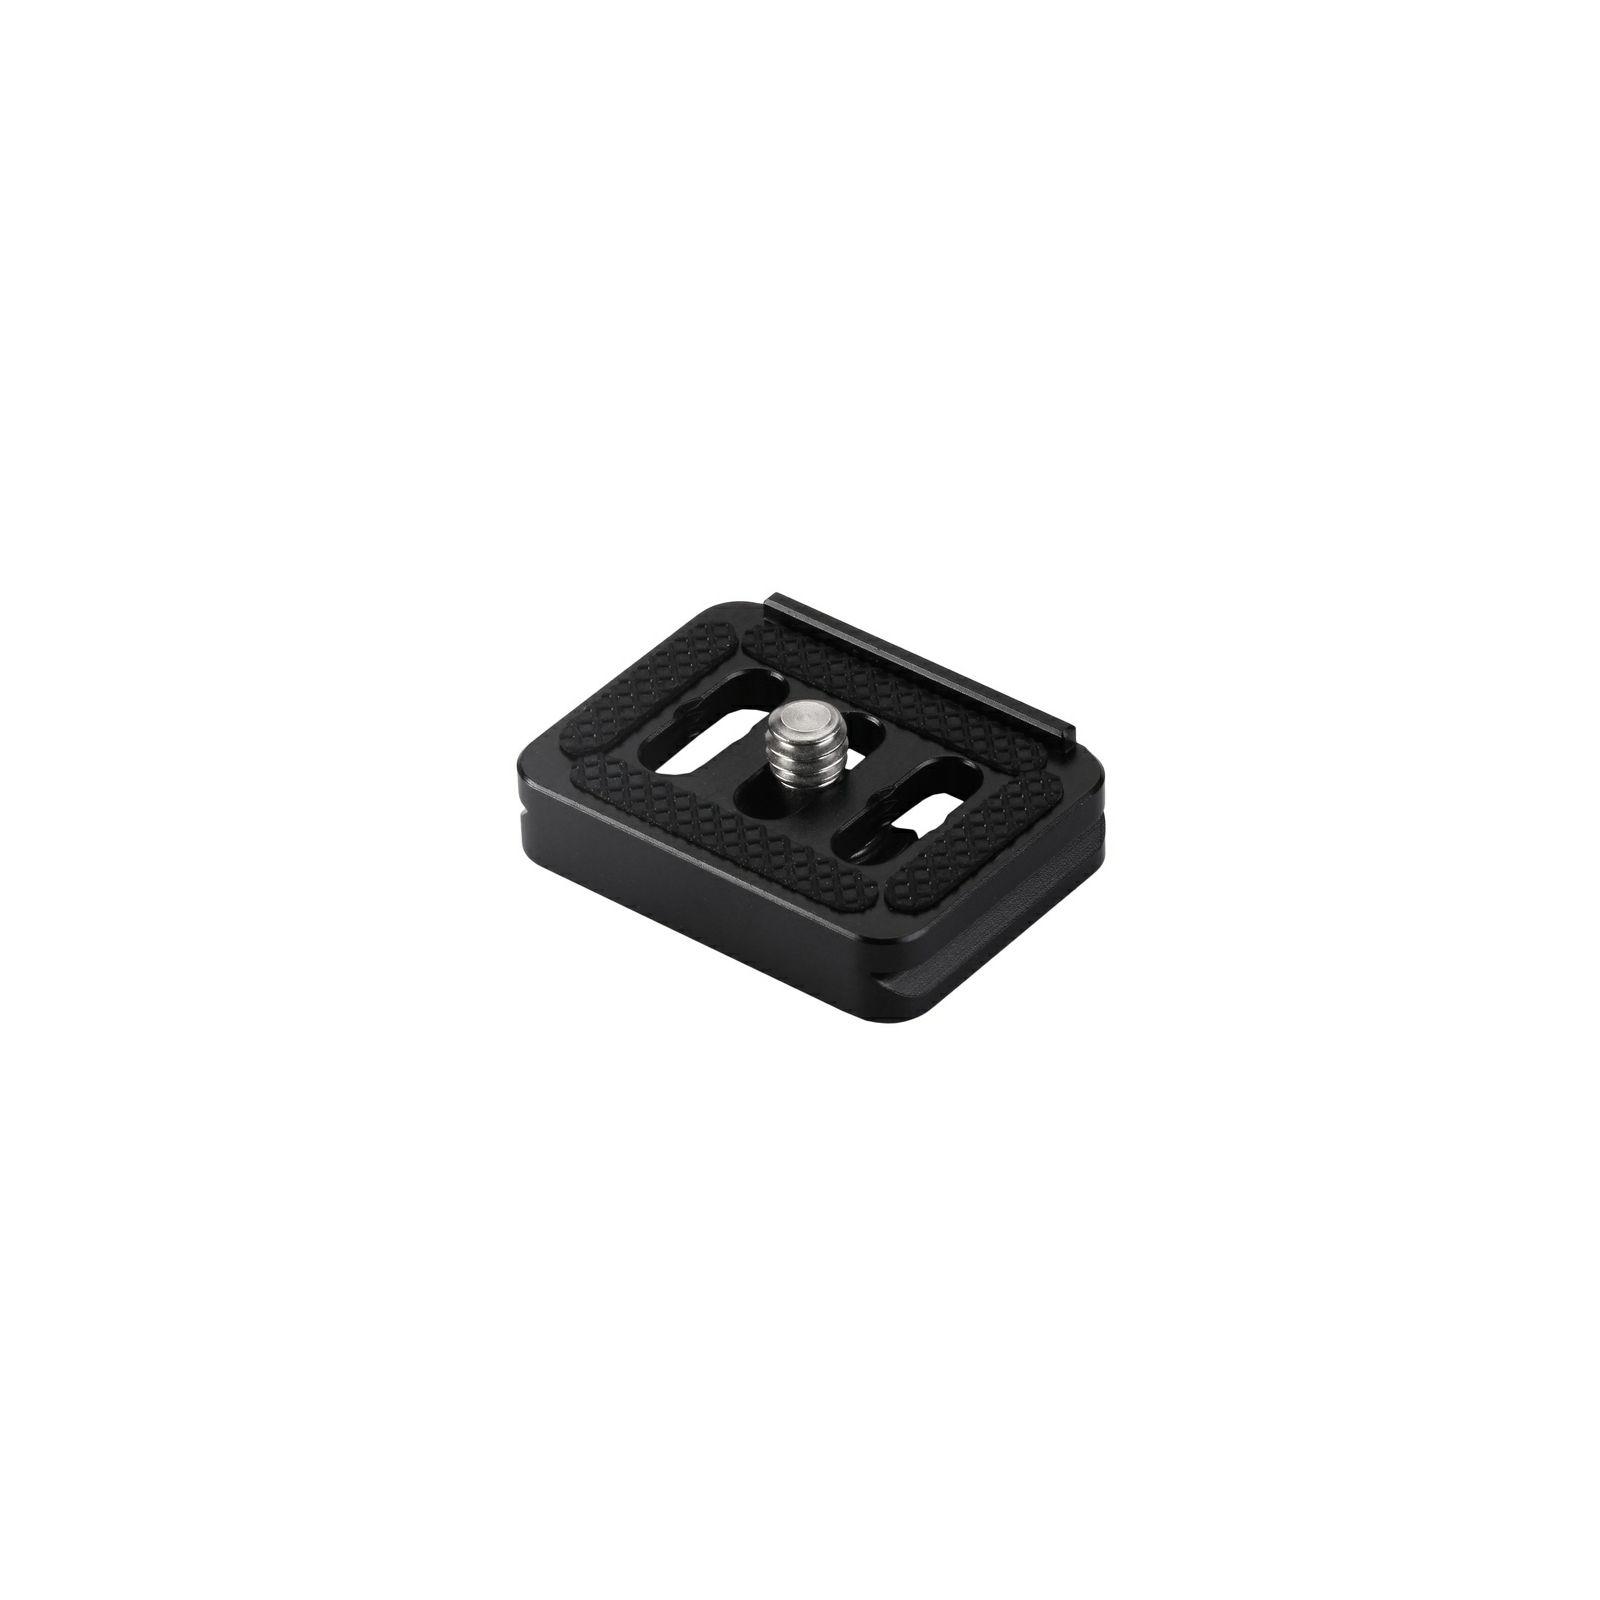 Genesis PLA-28 quick release plate of Arca-Swiss type pločica za glavu stativa